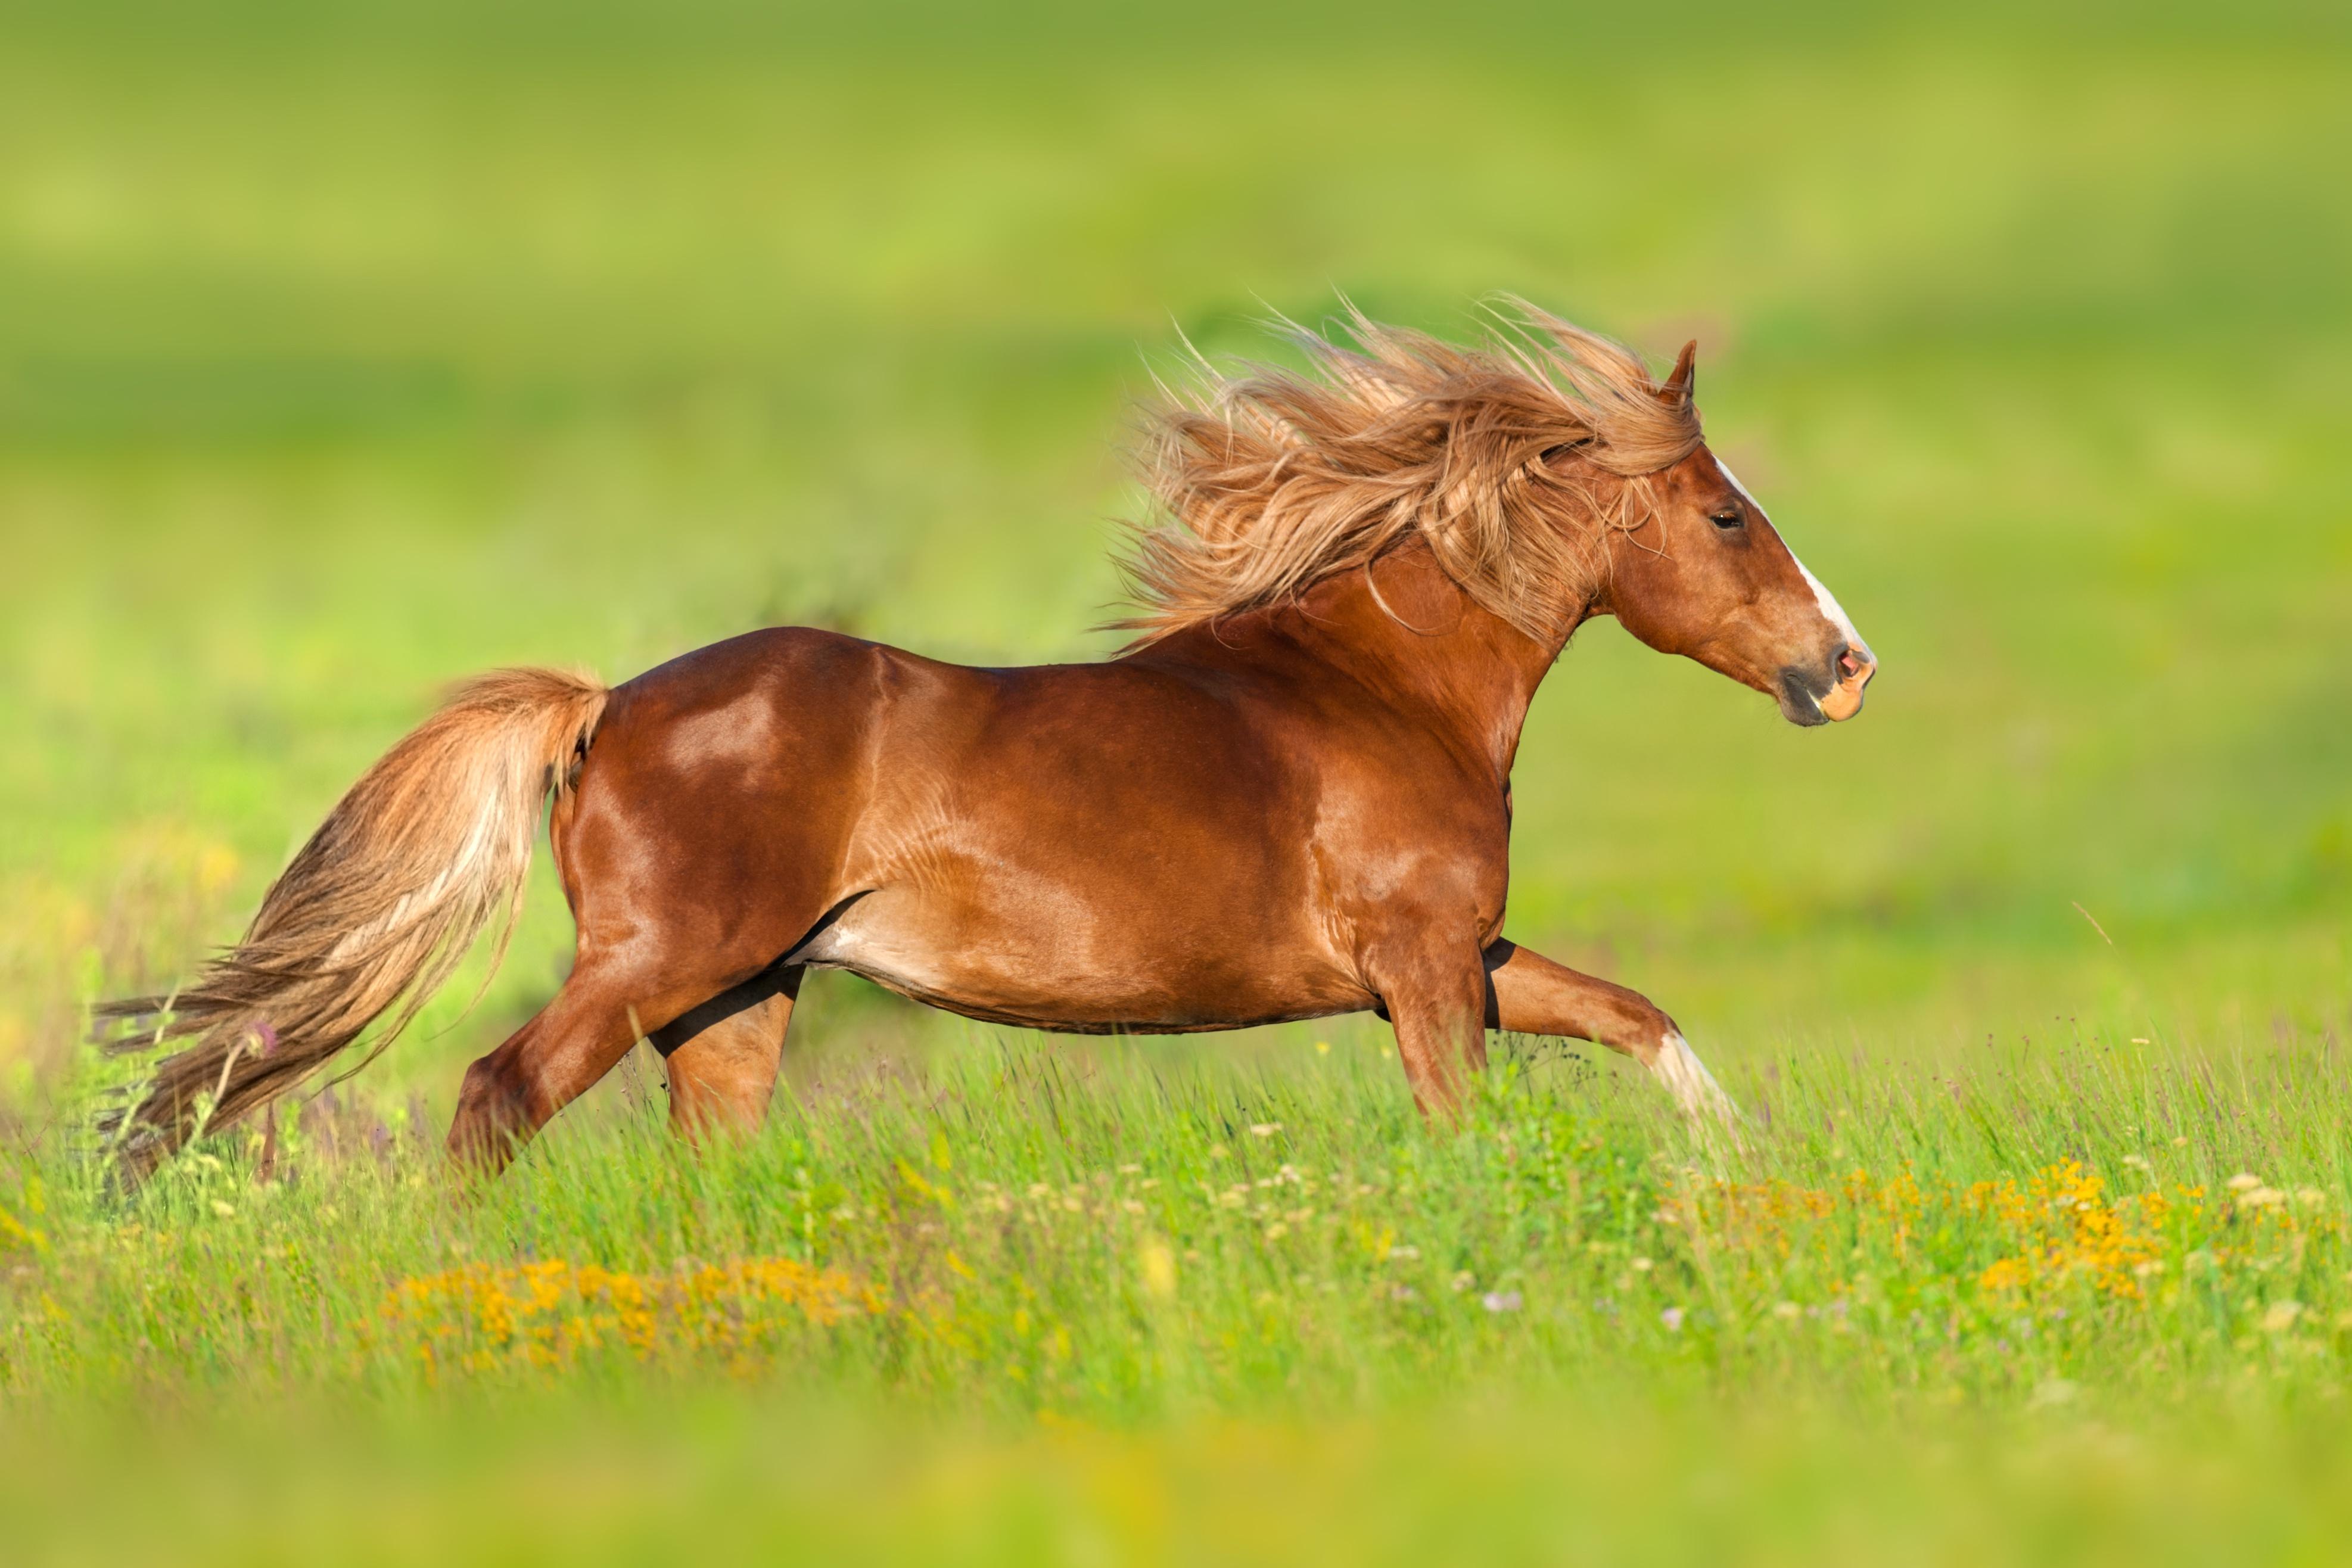 Horse 4K Ultra Hd Wallpaper  Background Image  3948X2632 -1728